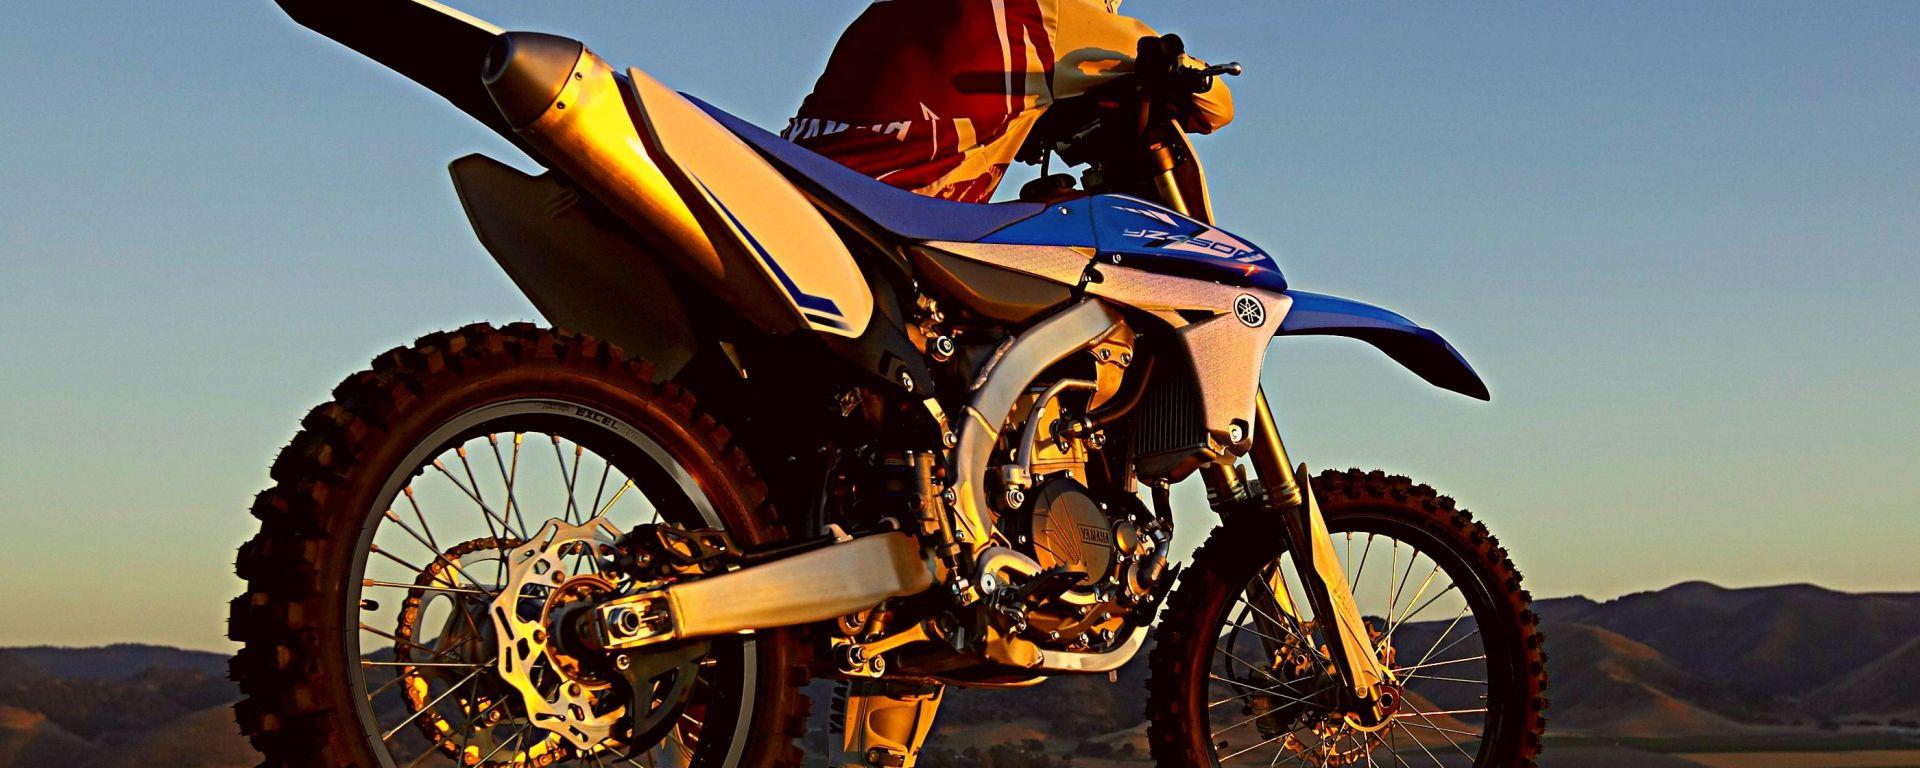 Yamaha gamma offroad 2013: le prove